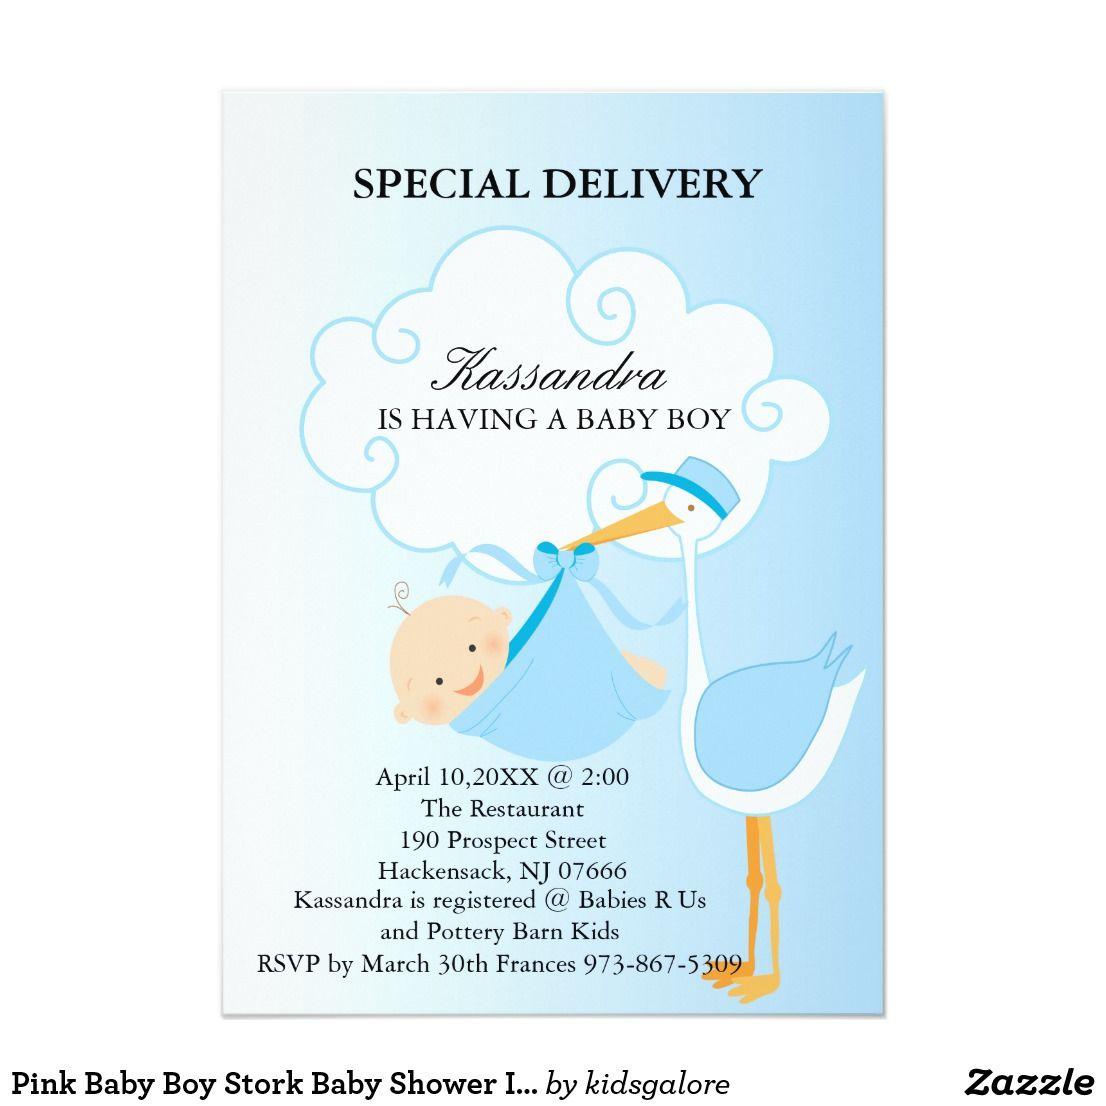 Pink Baby Boy Stork Baby Shower Invitation | Stork baby showers ...